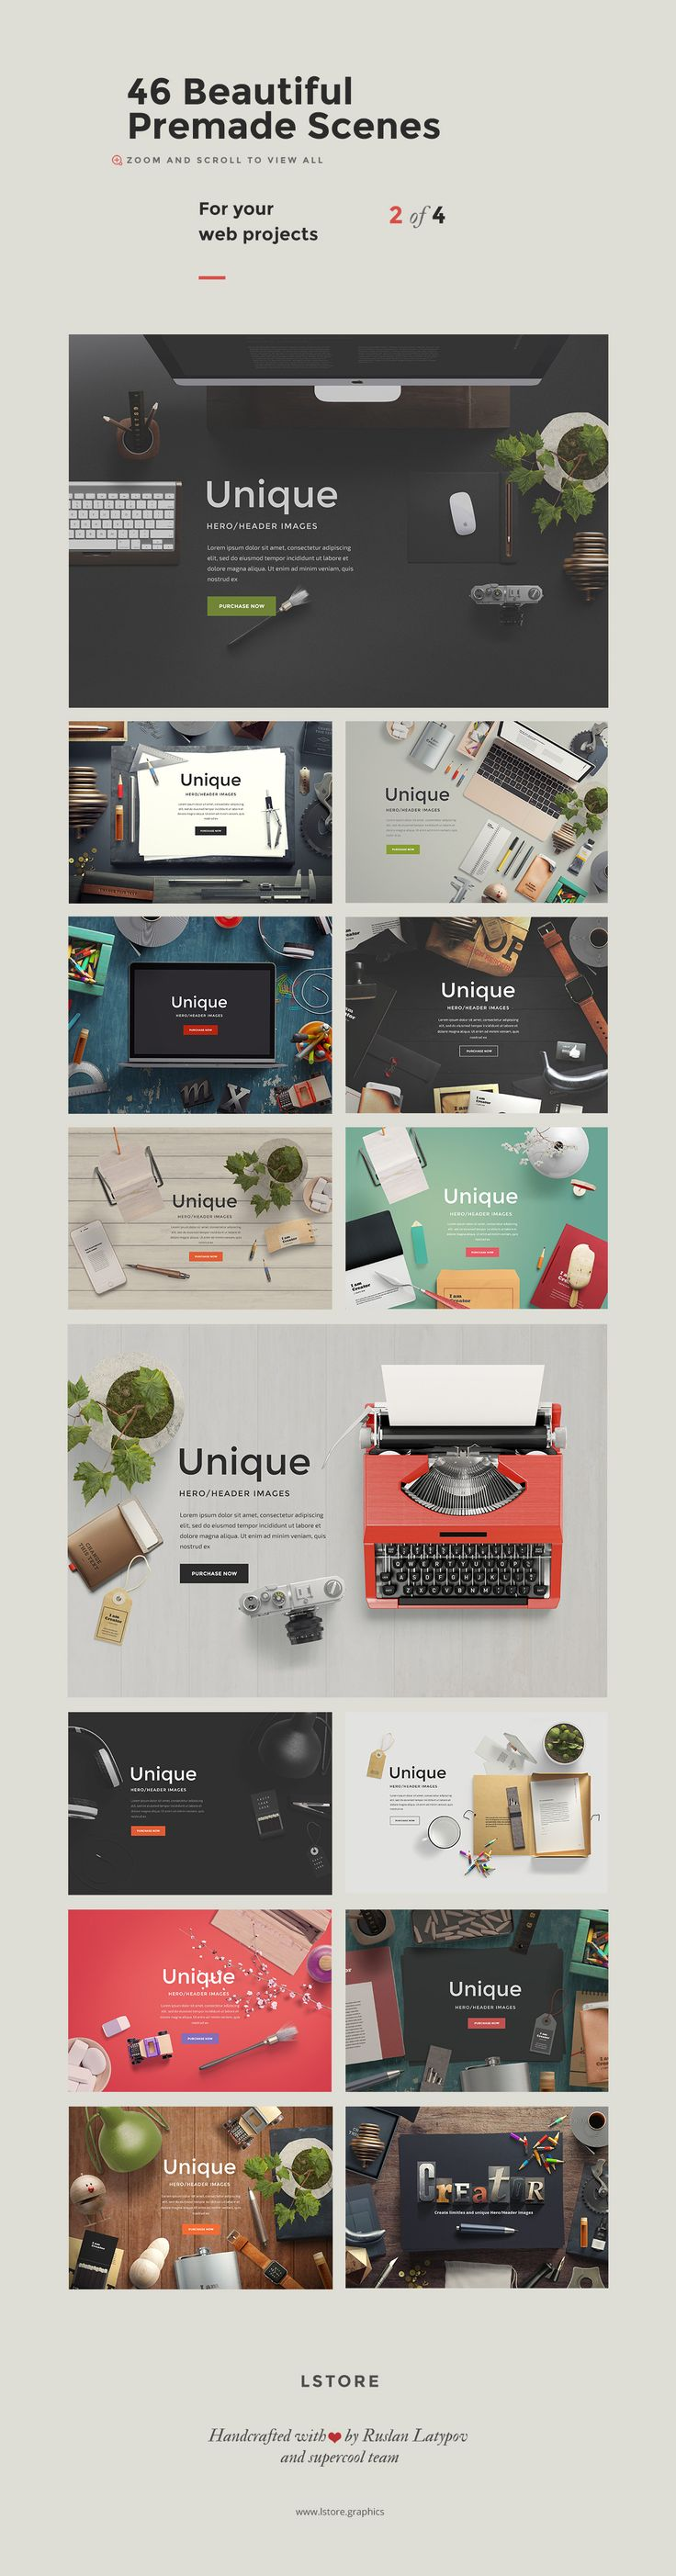 Poster design generator - I Am Creator Topview